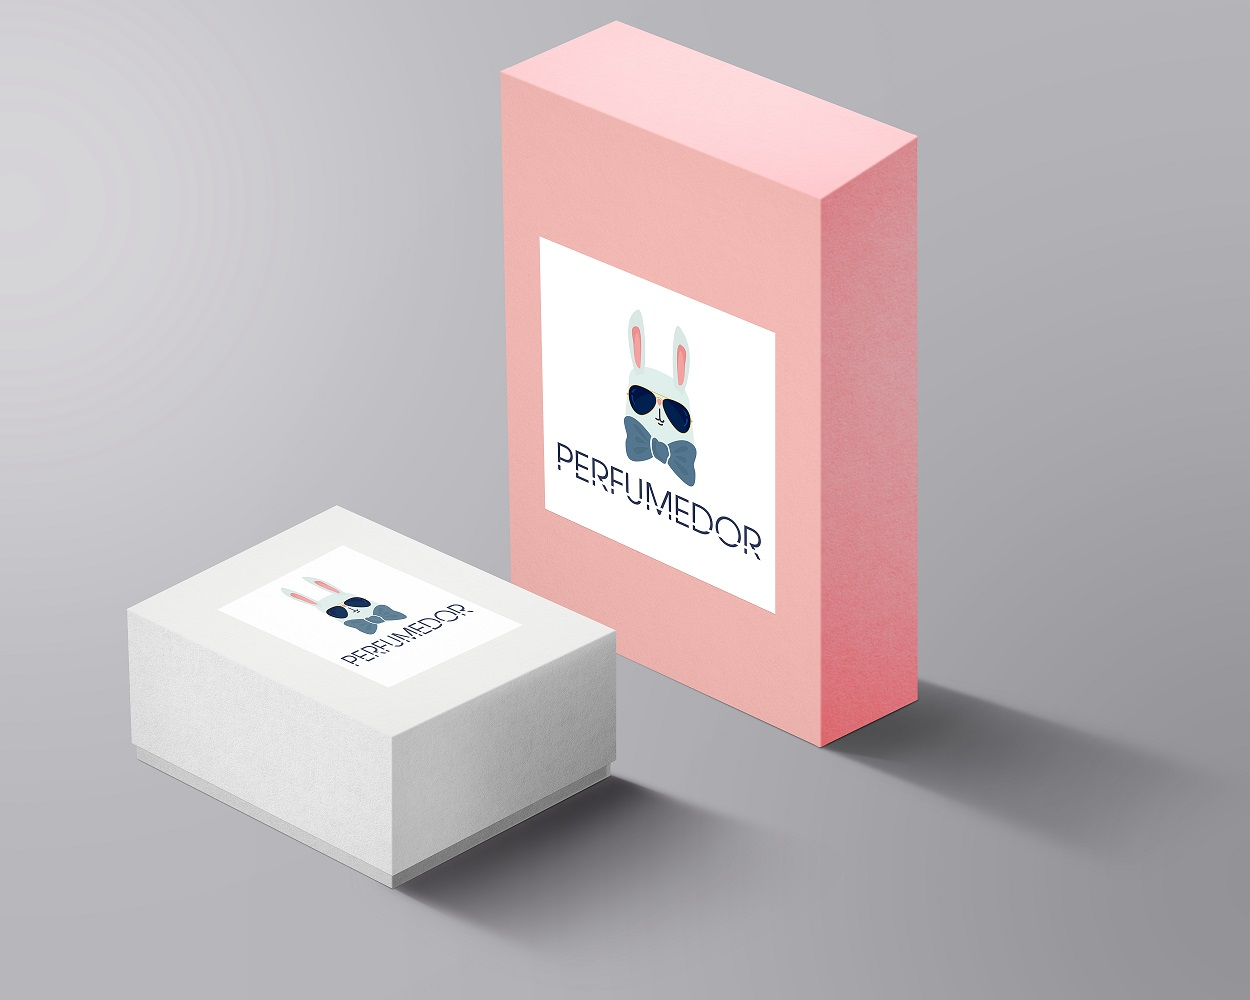 Логотип для интернет-магазина парфюмерии фото f_9765b44d4eef2b55.jpg